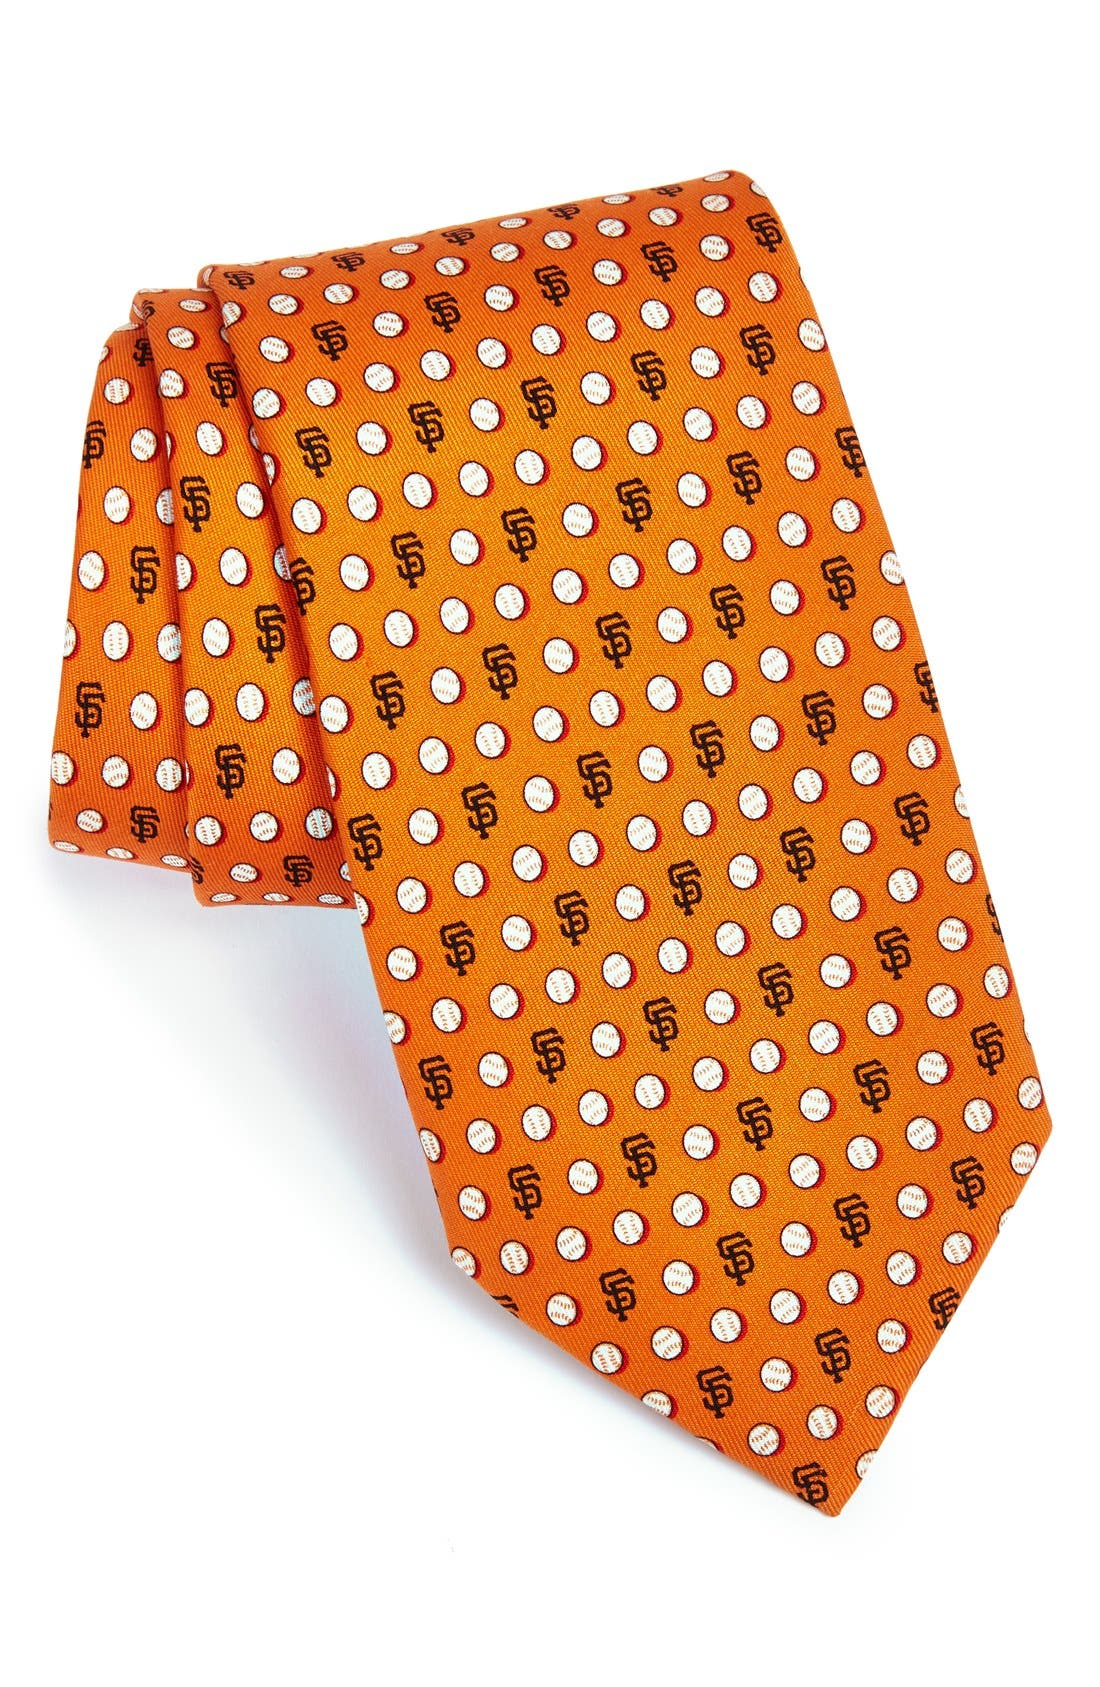 'San Francisco Giants - MLB' Woven Silk Tie,                             Main thumbnail 1, color,                             Orange